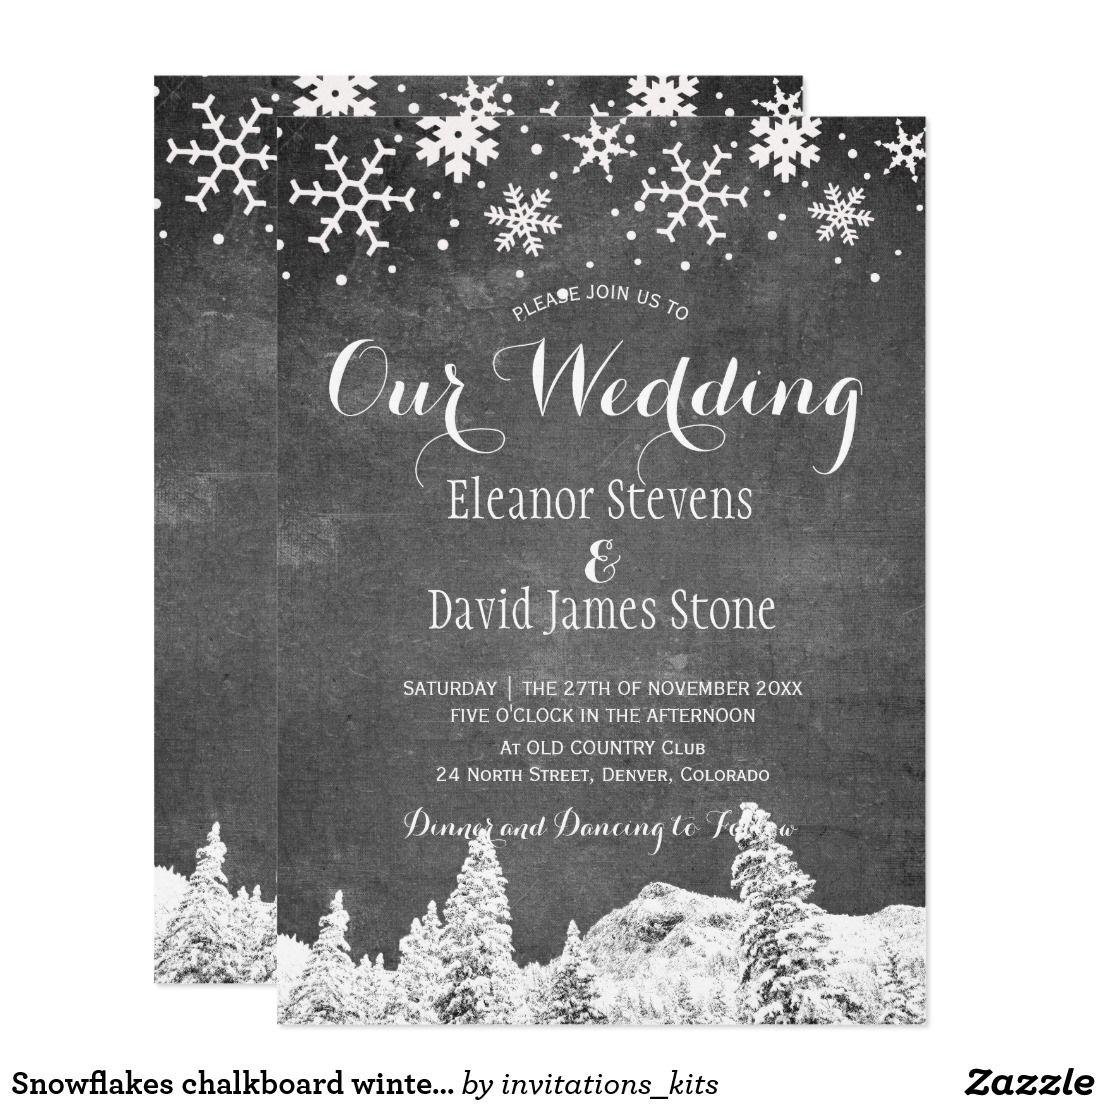 Snowflakes chalkboard winter woodland wedding invitation   Pinterest ...